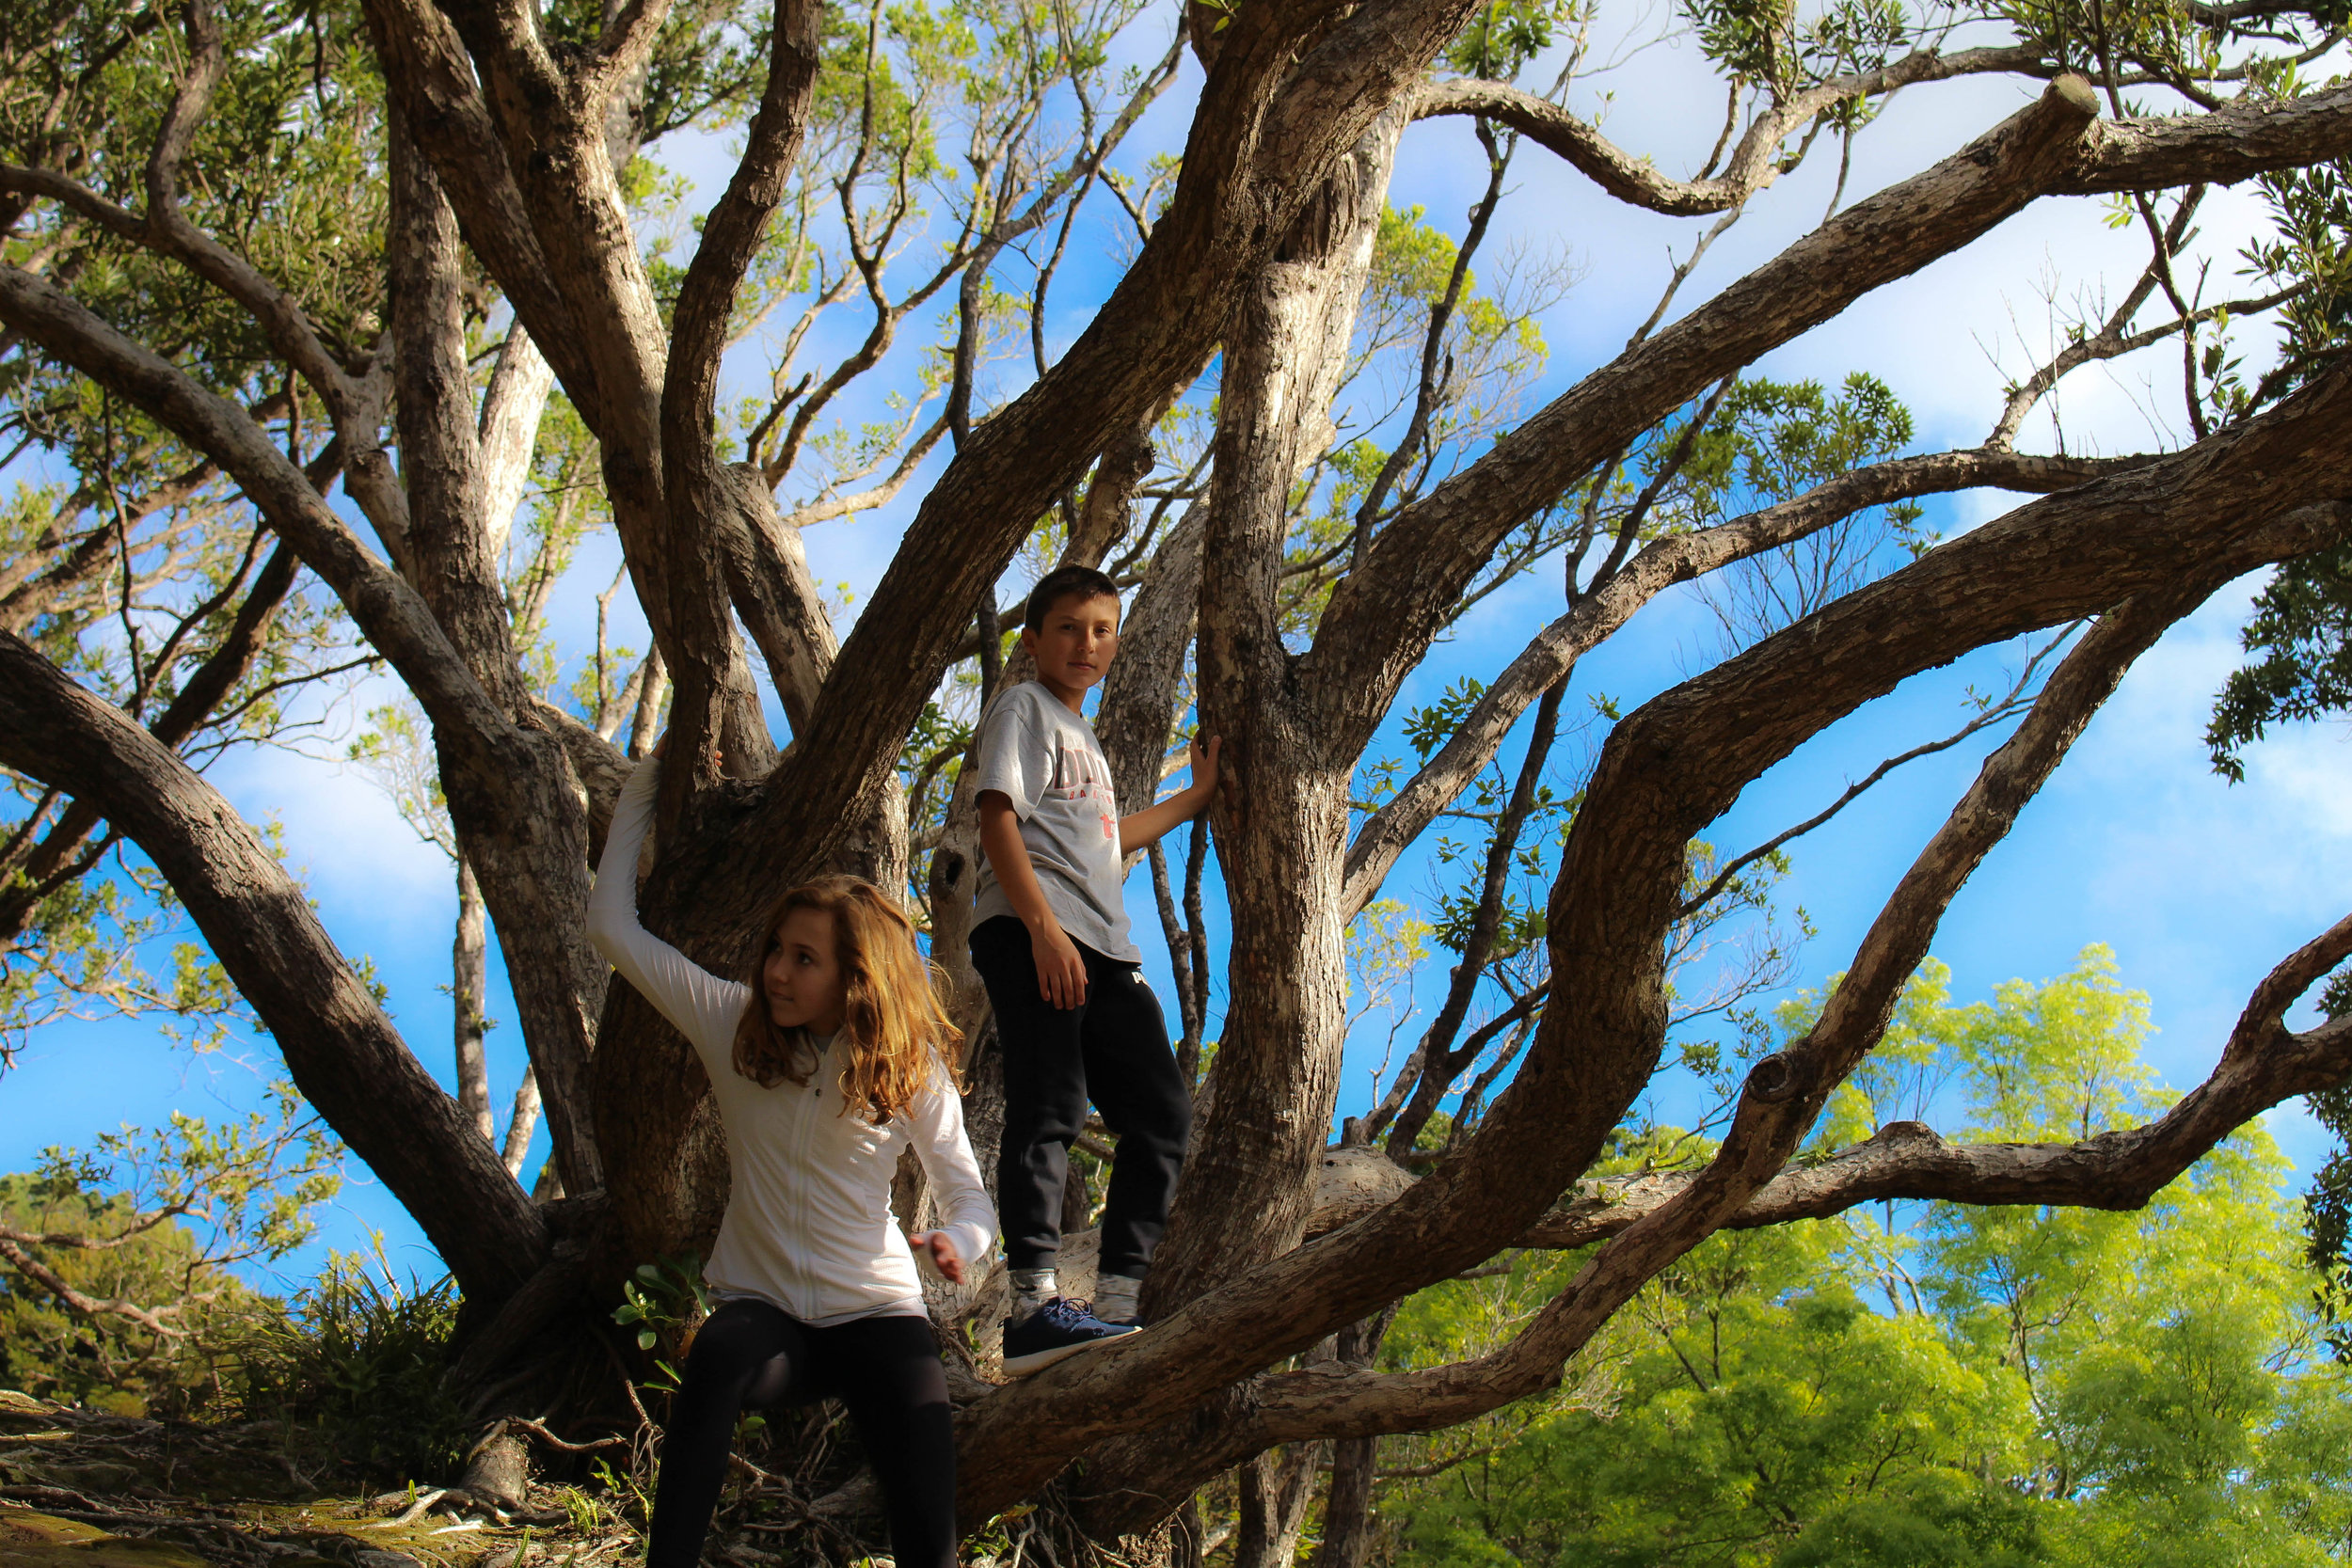 kids-in-tree-1-of-1